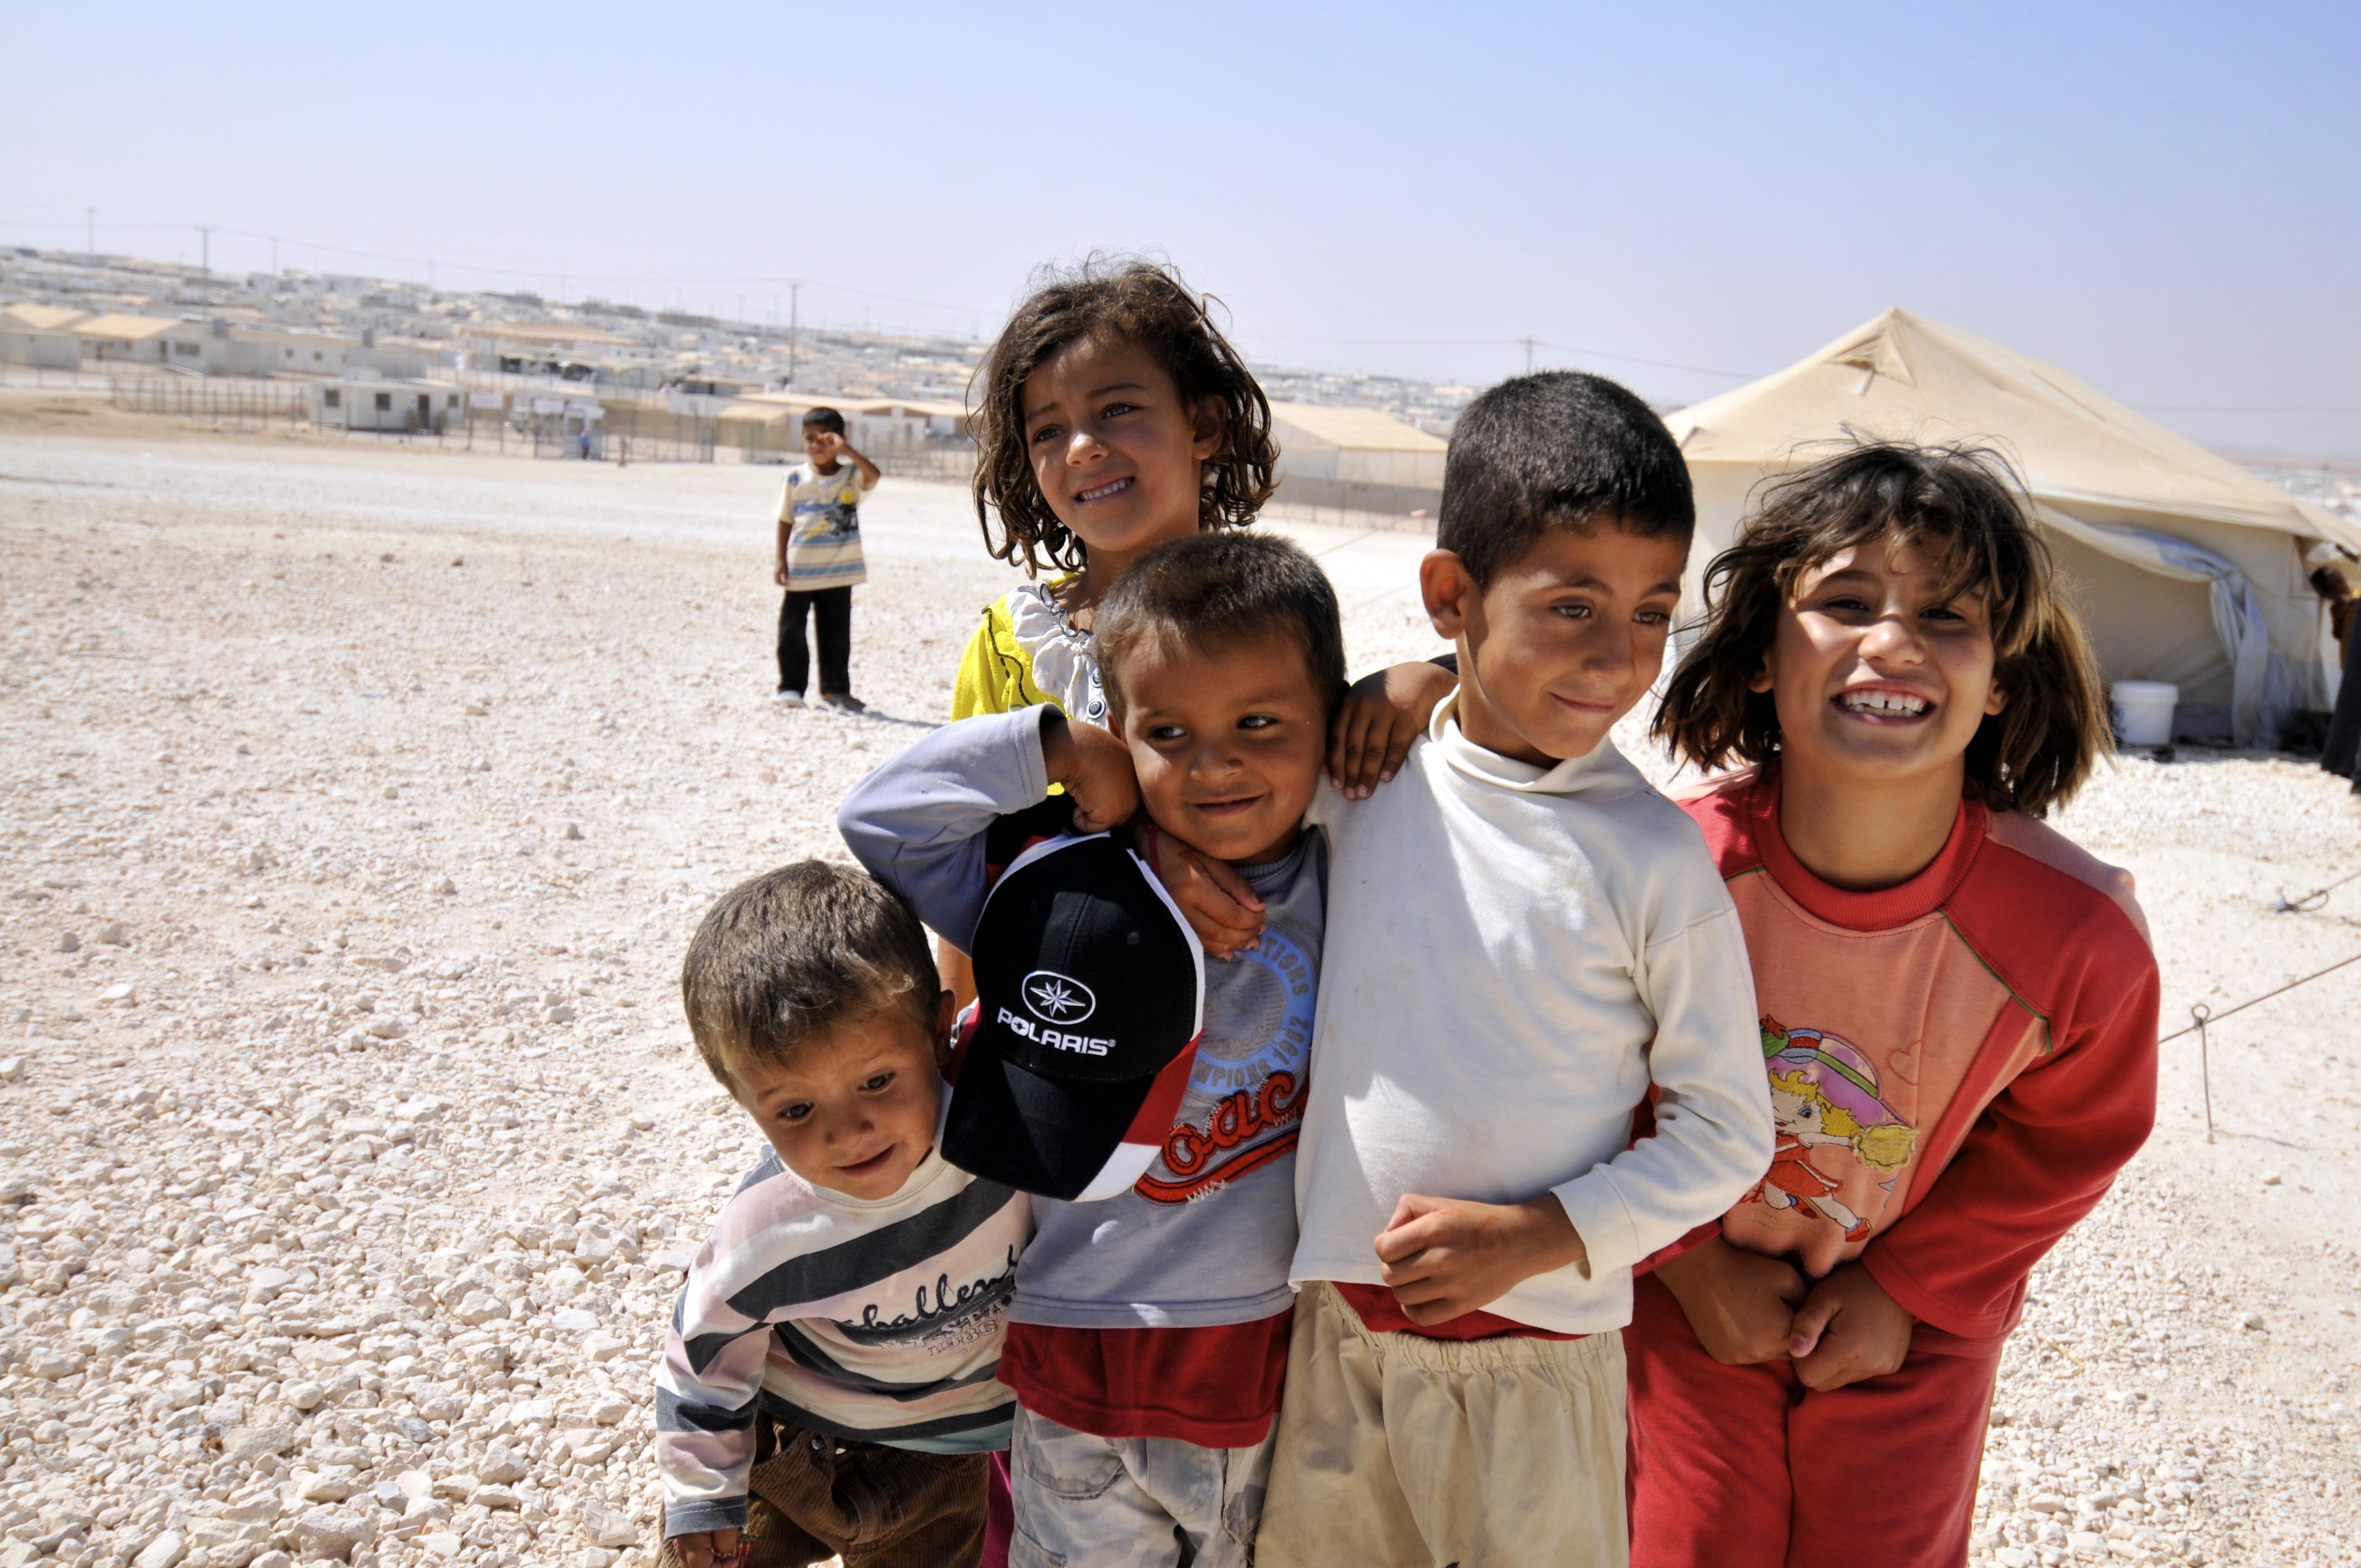 Jordanian ministry serves refugee and orphaned children